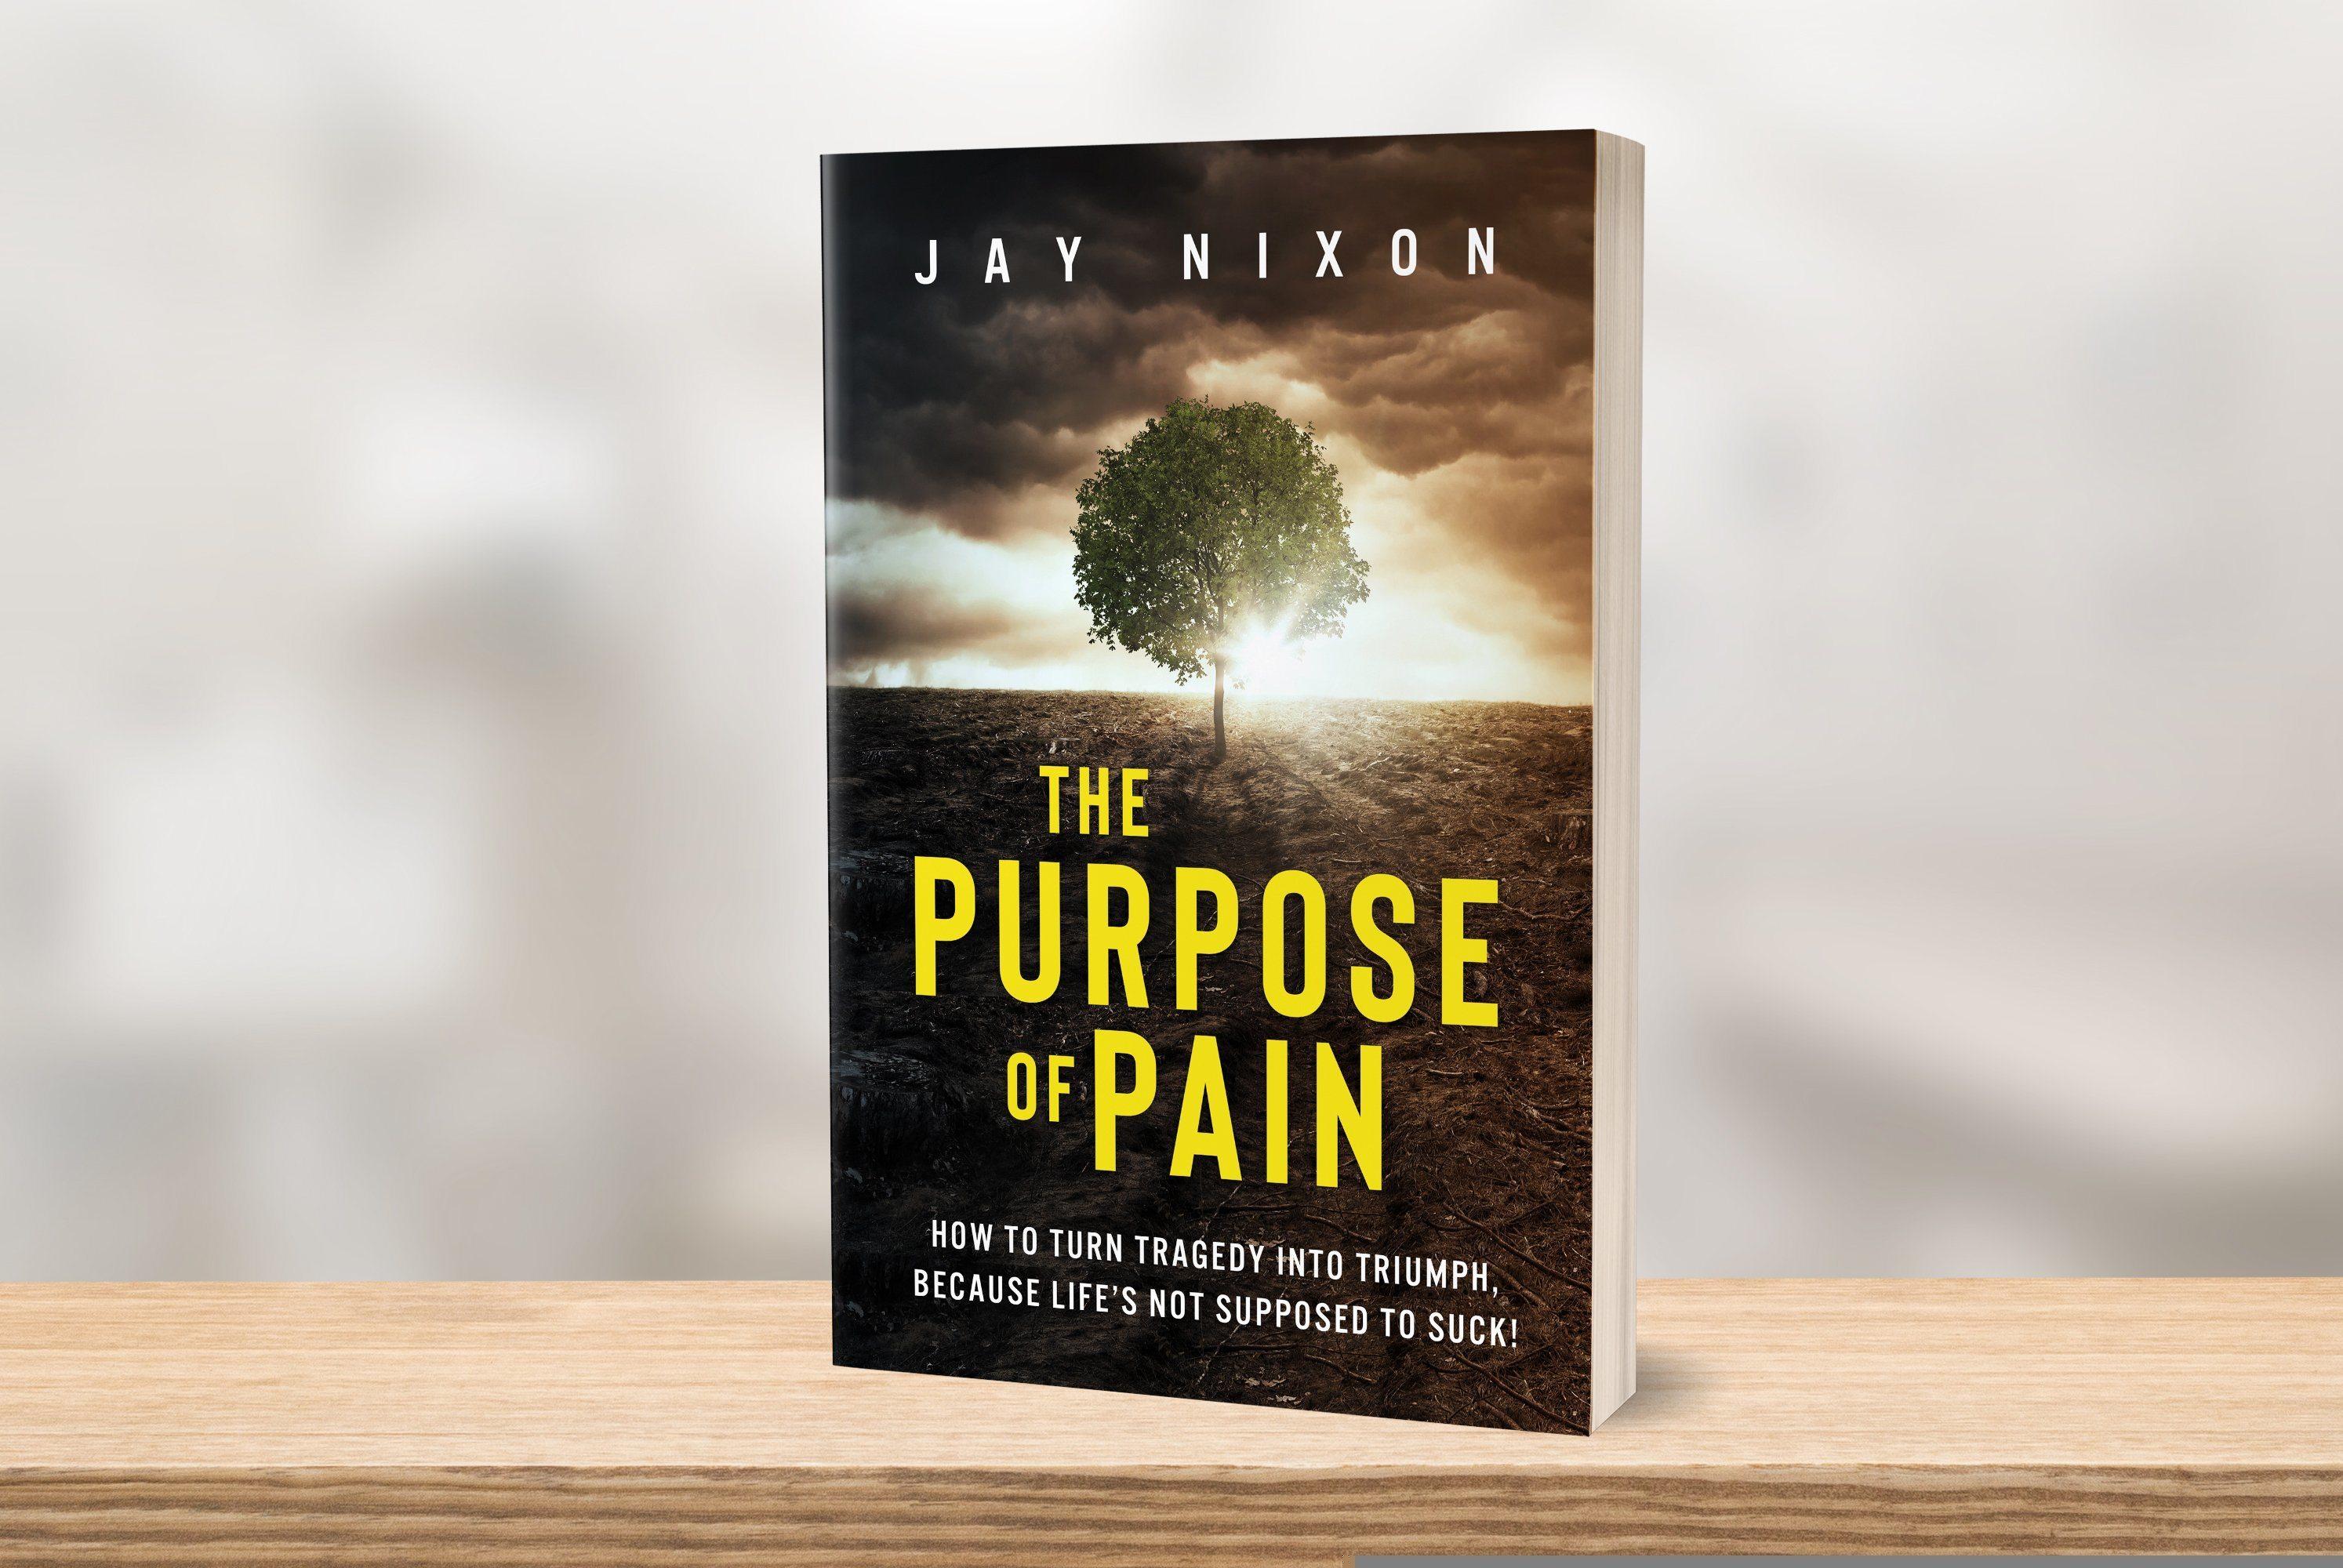 Jay Nixon - The Purpose of Pain